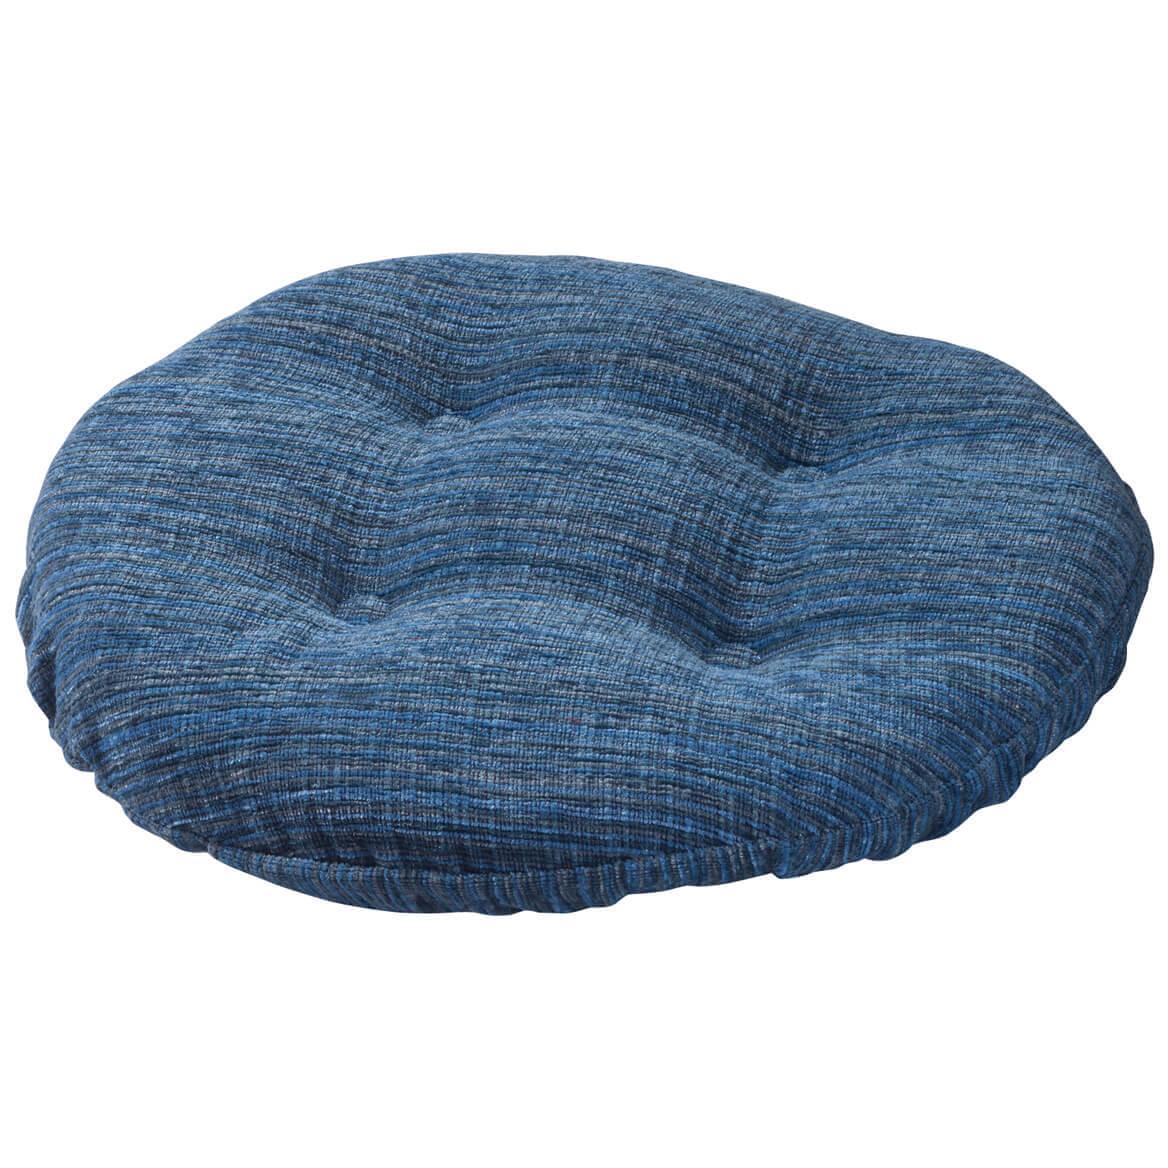 chenille round bar stool cushion - Bar Stool Cushions